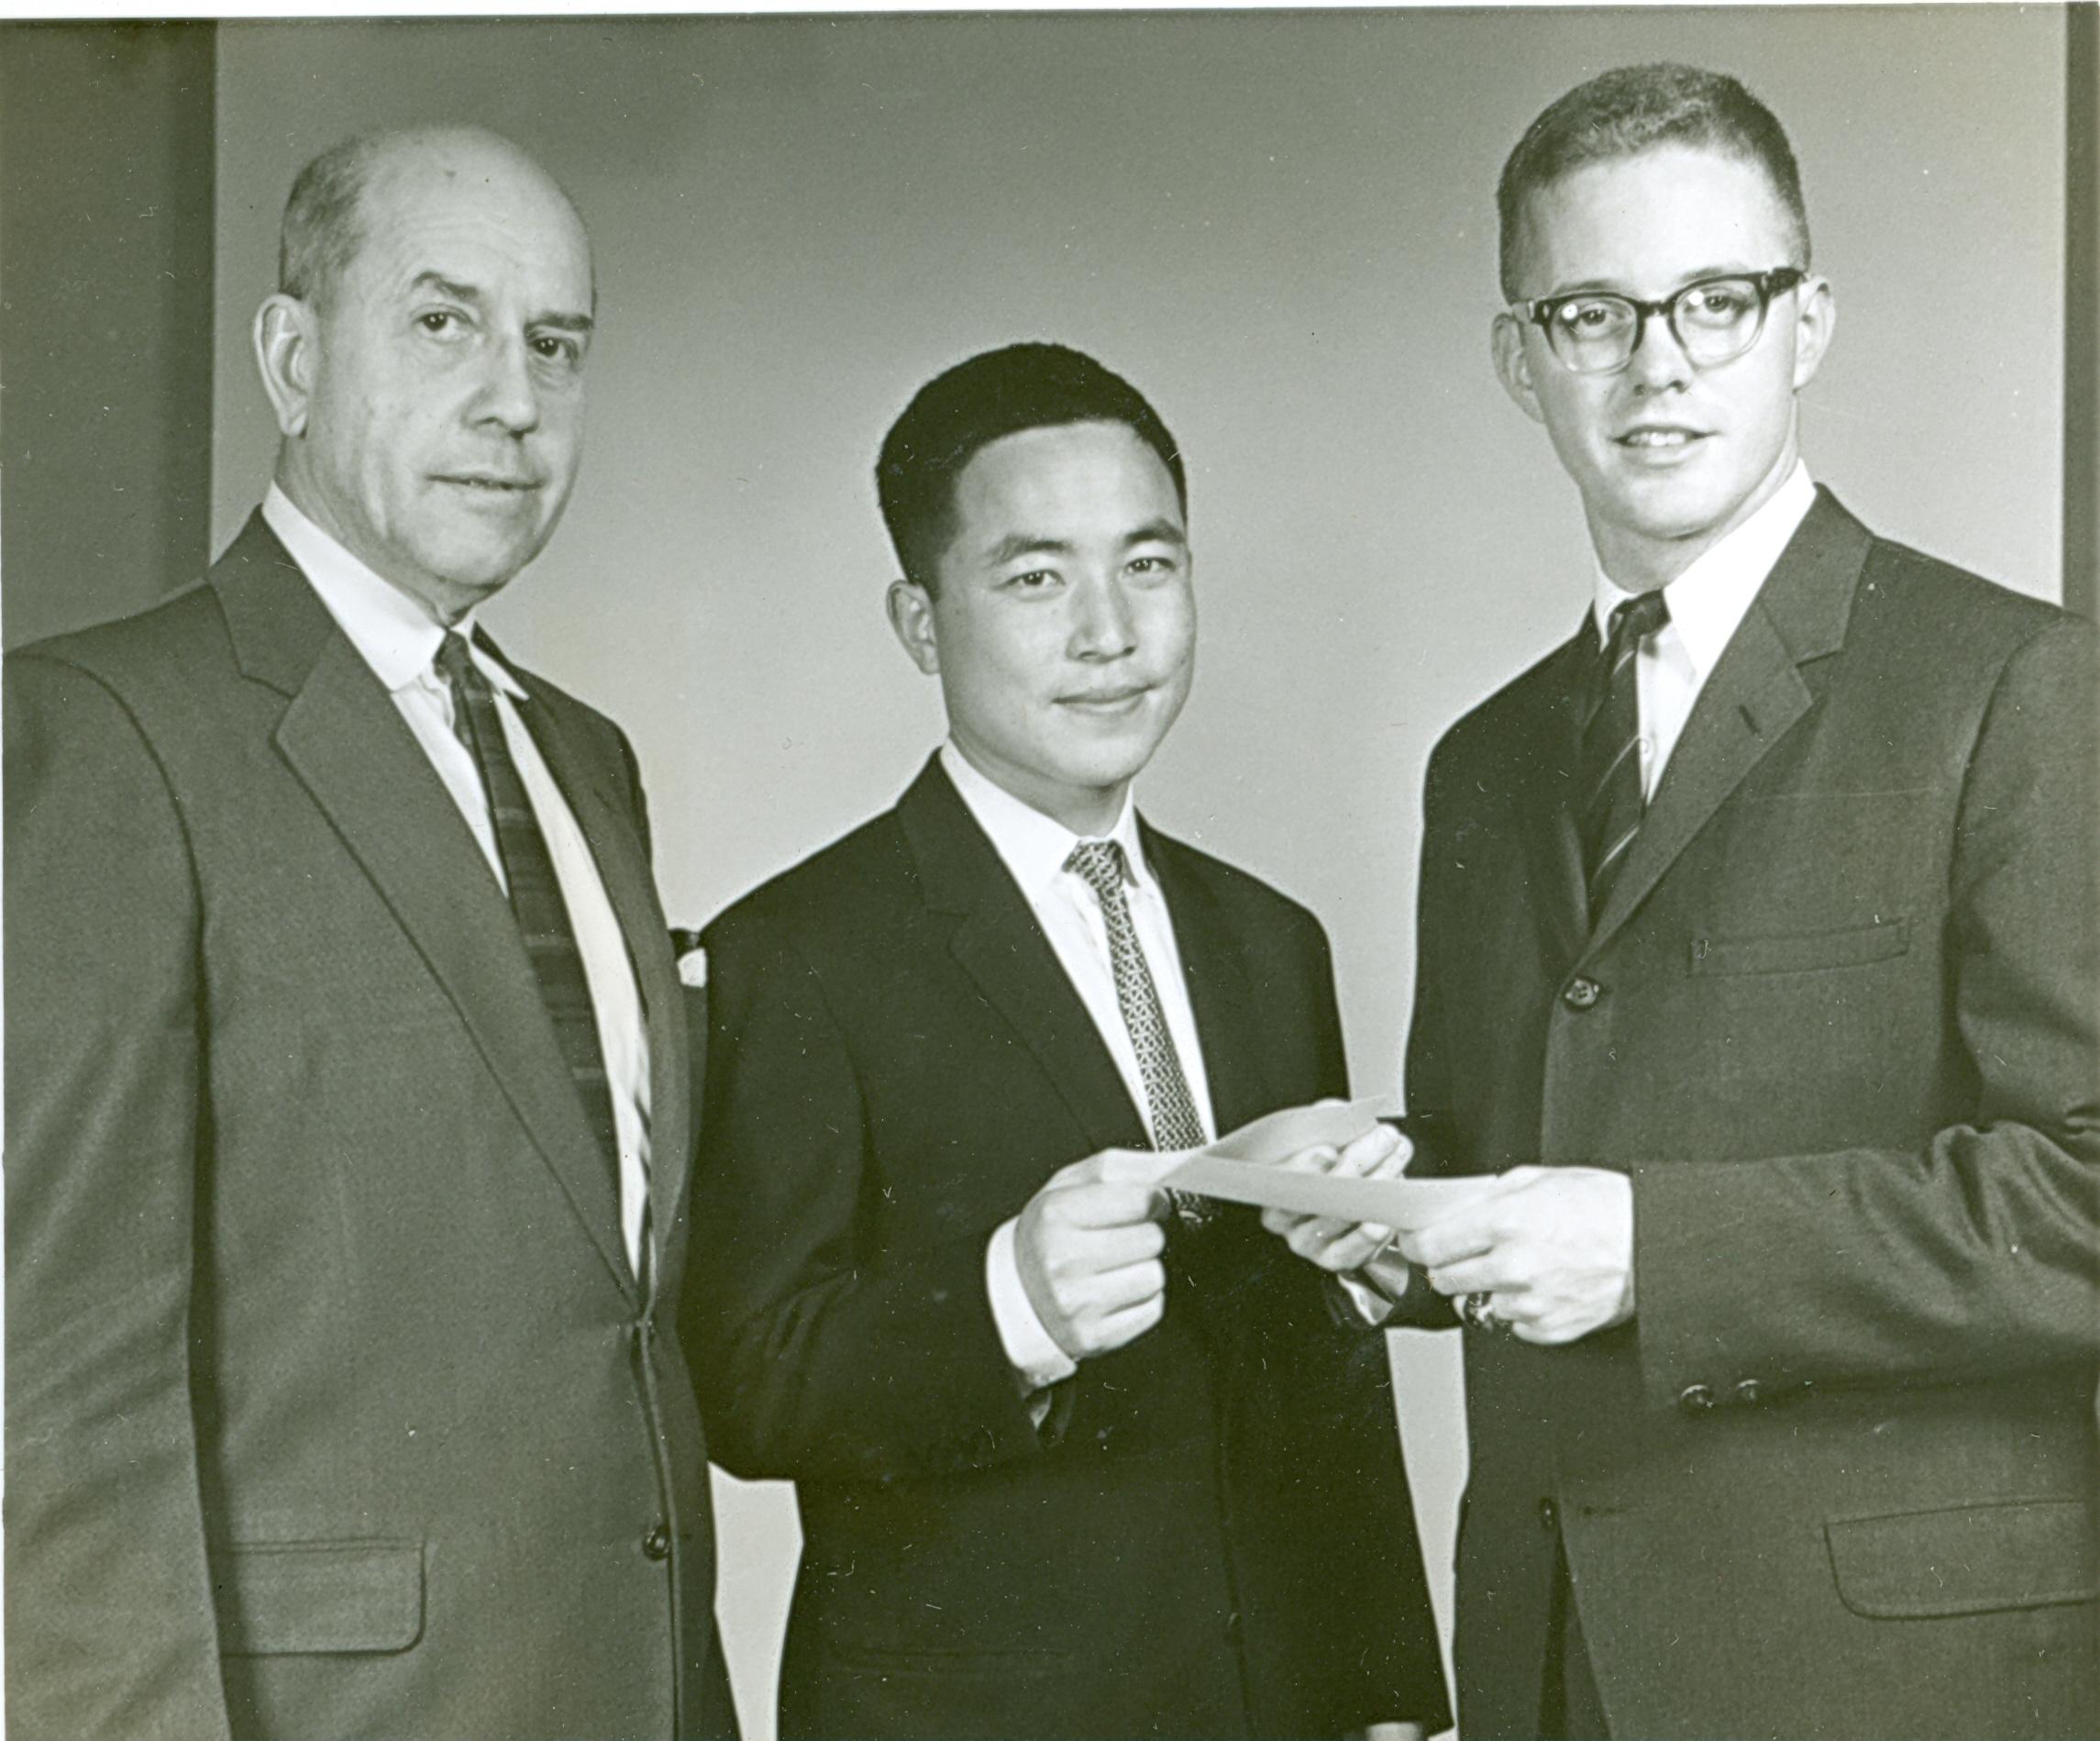 Winning the Rotary Club Travel Award at Auburn University, 1964